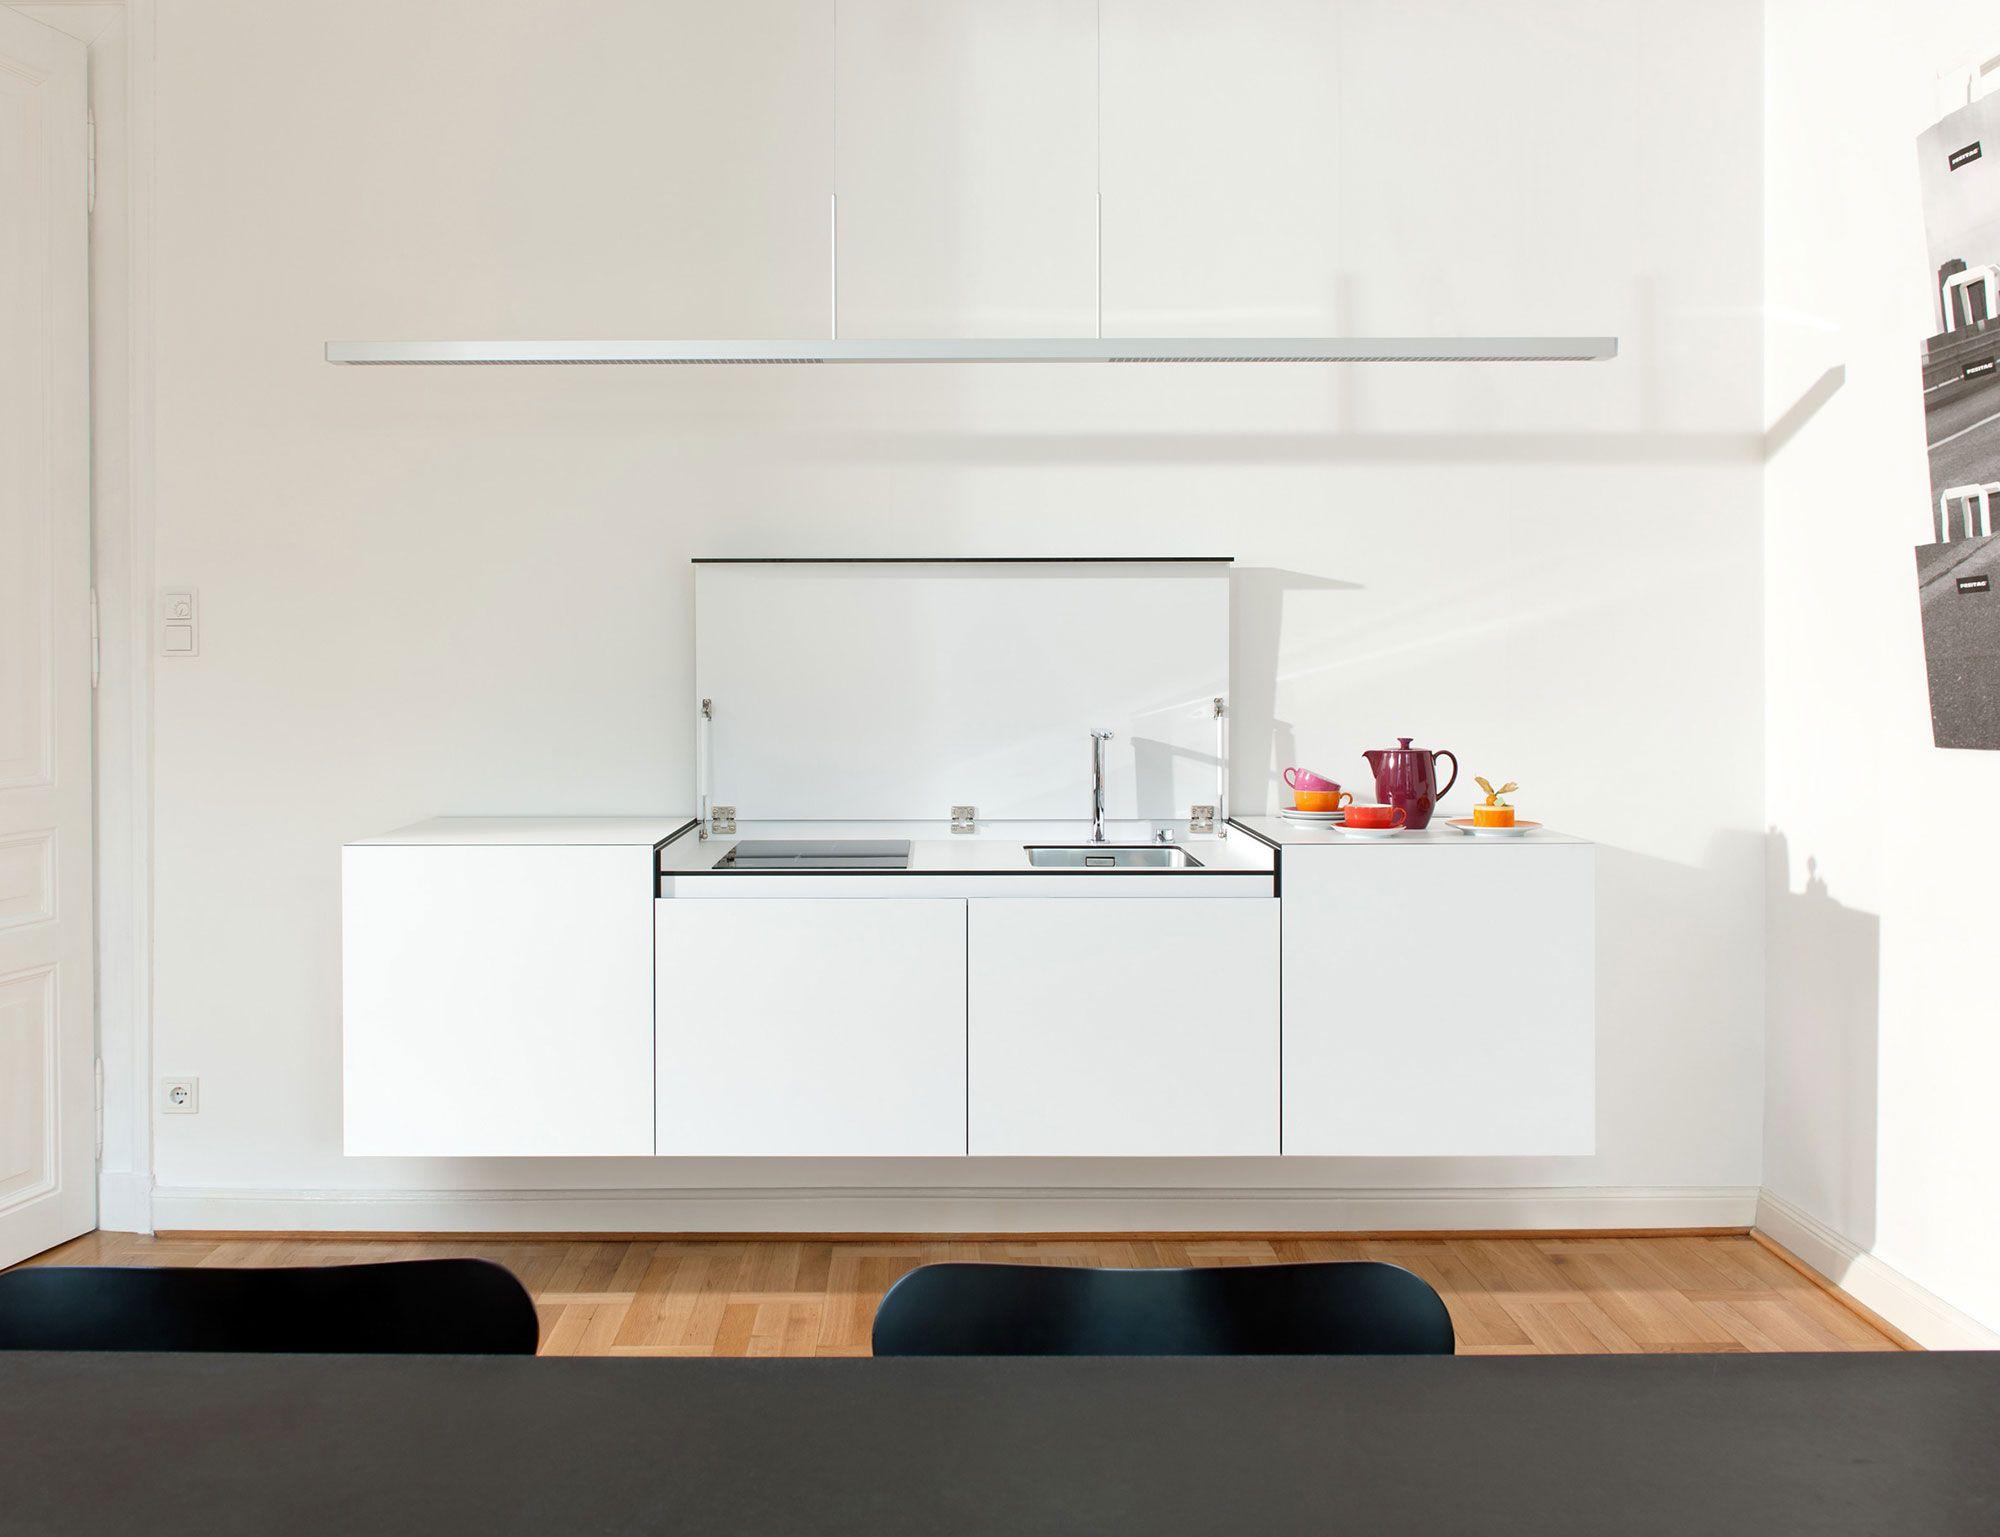 Ambienti Ikea Cucina miniki, minimalist hideaway kitchen | minimal kitchen design